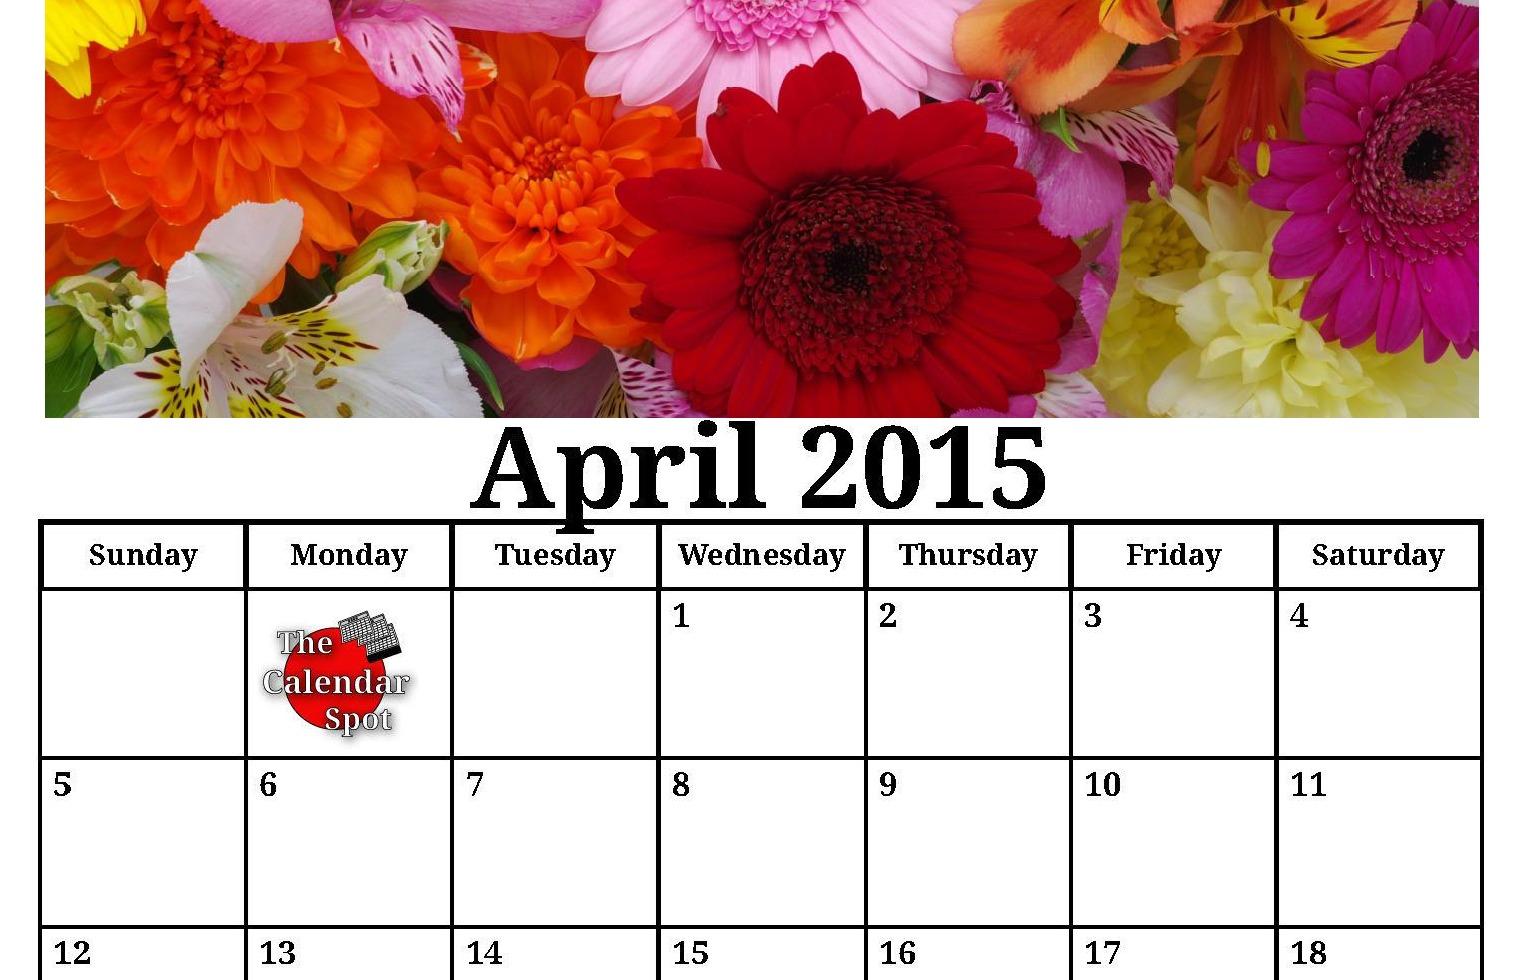 April 2015 Calendar Printable with Flowers